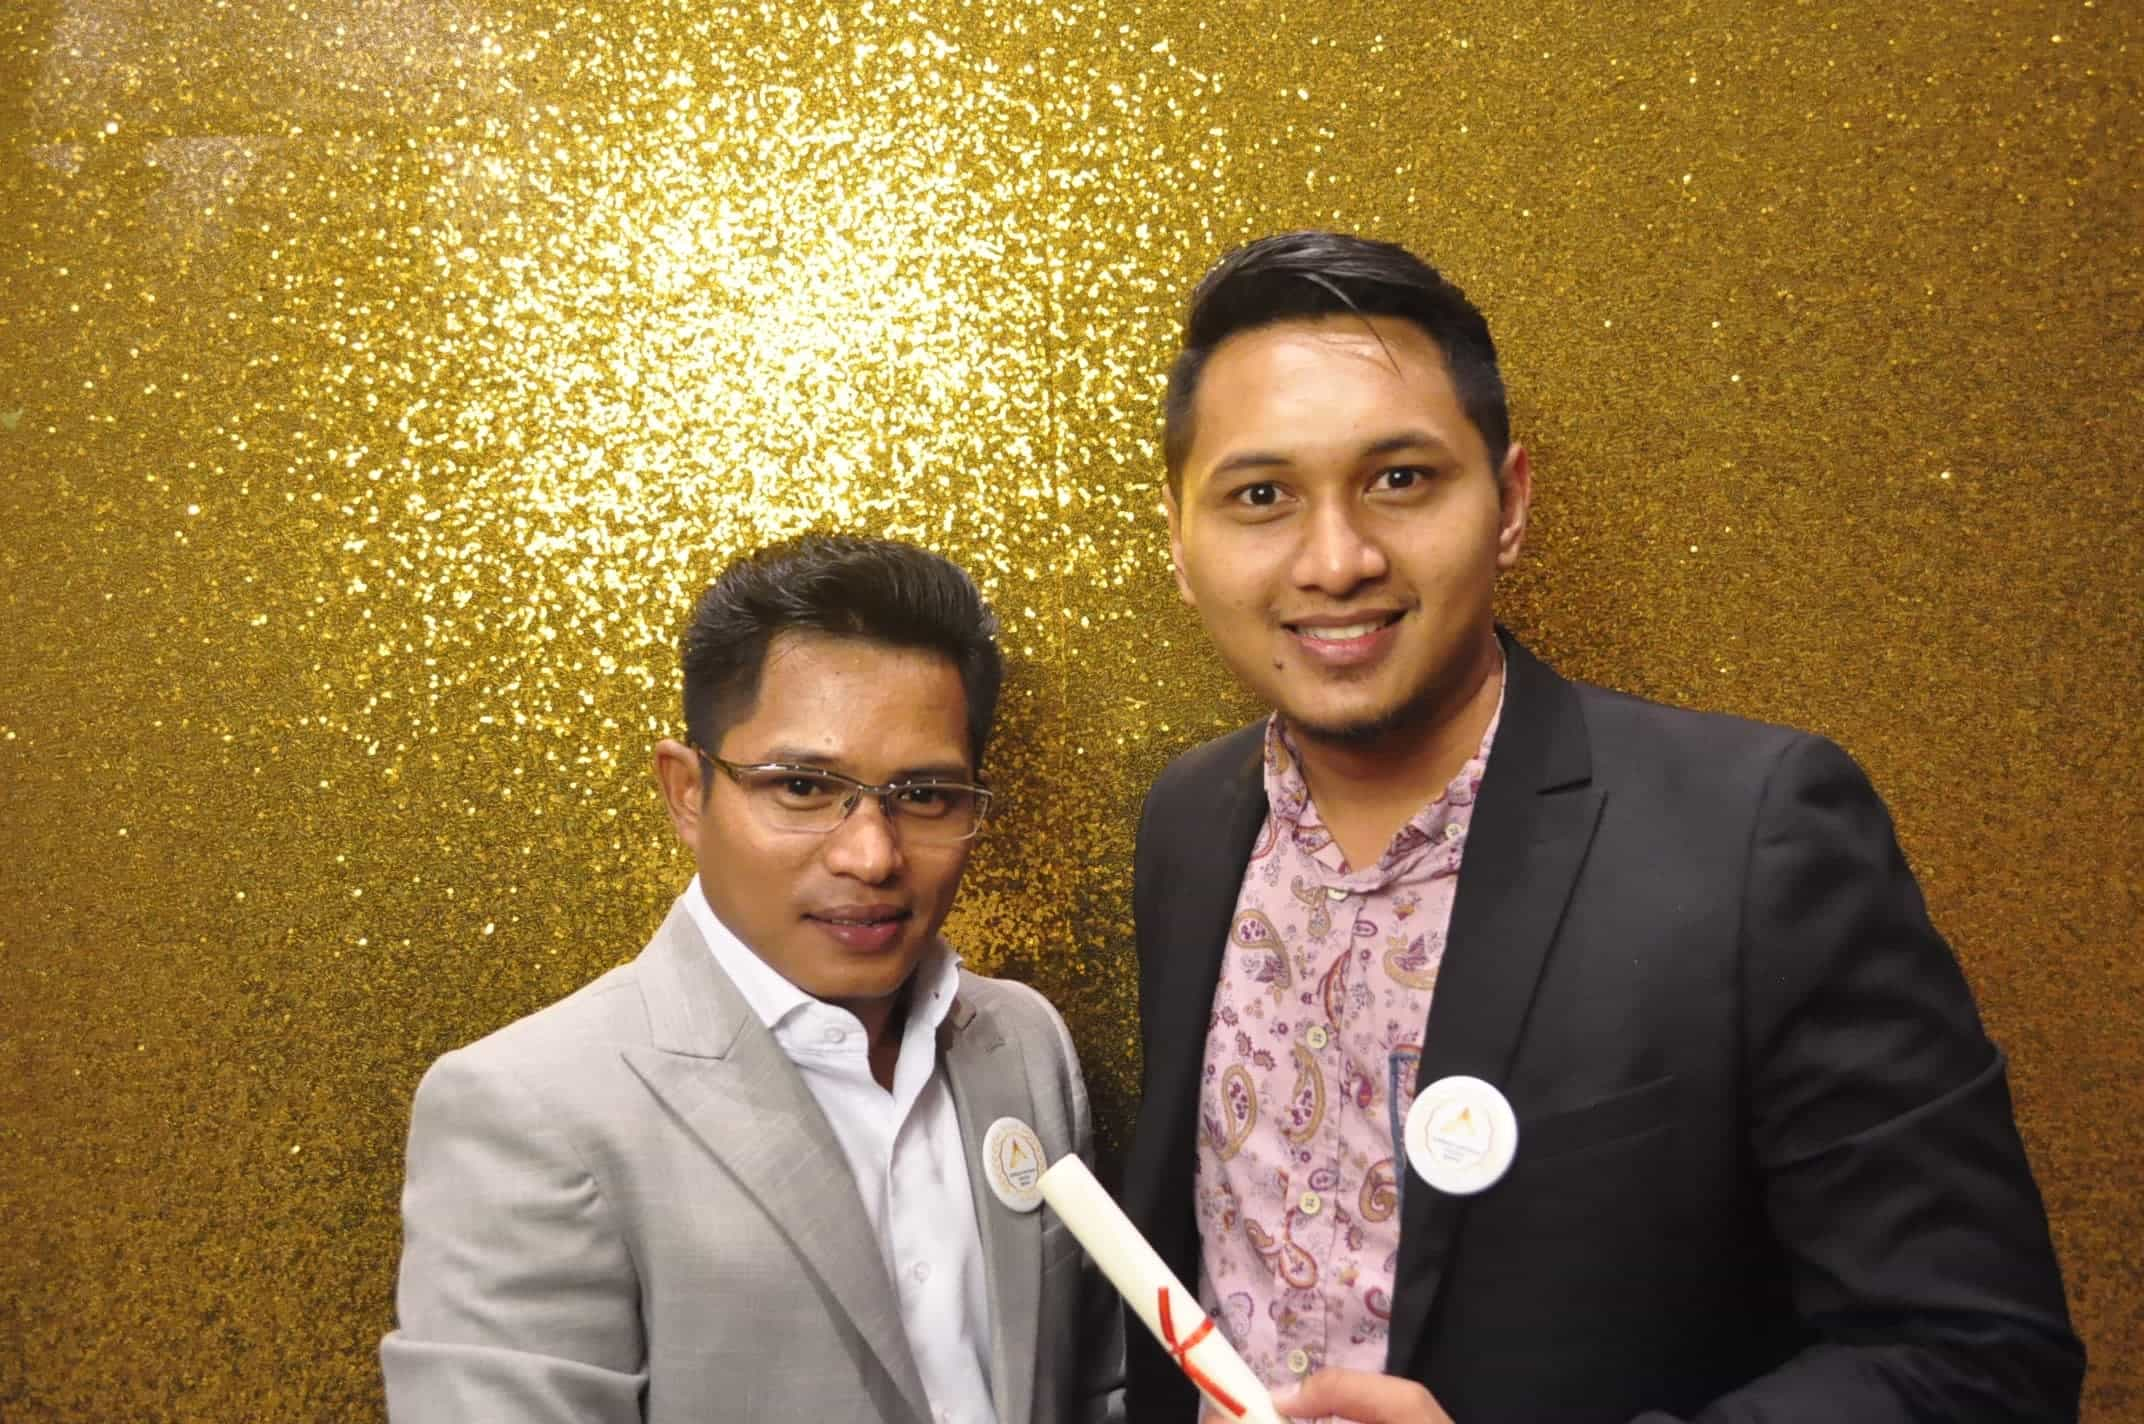 Malam Gala Anggun 2018 (Photobooth) 6